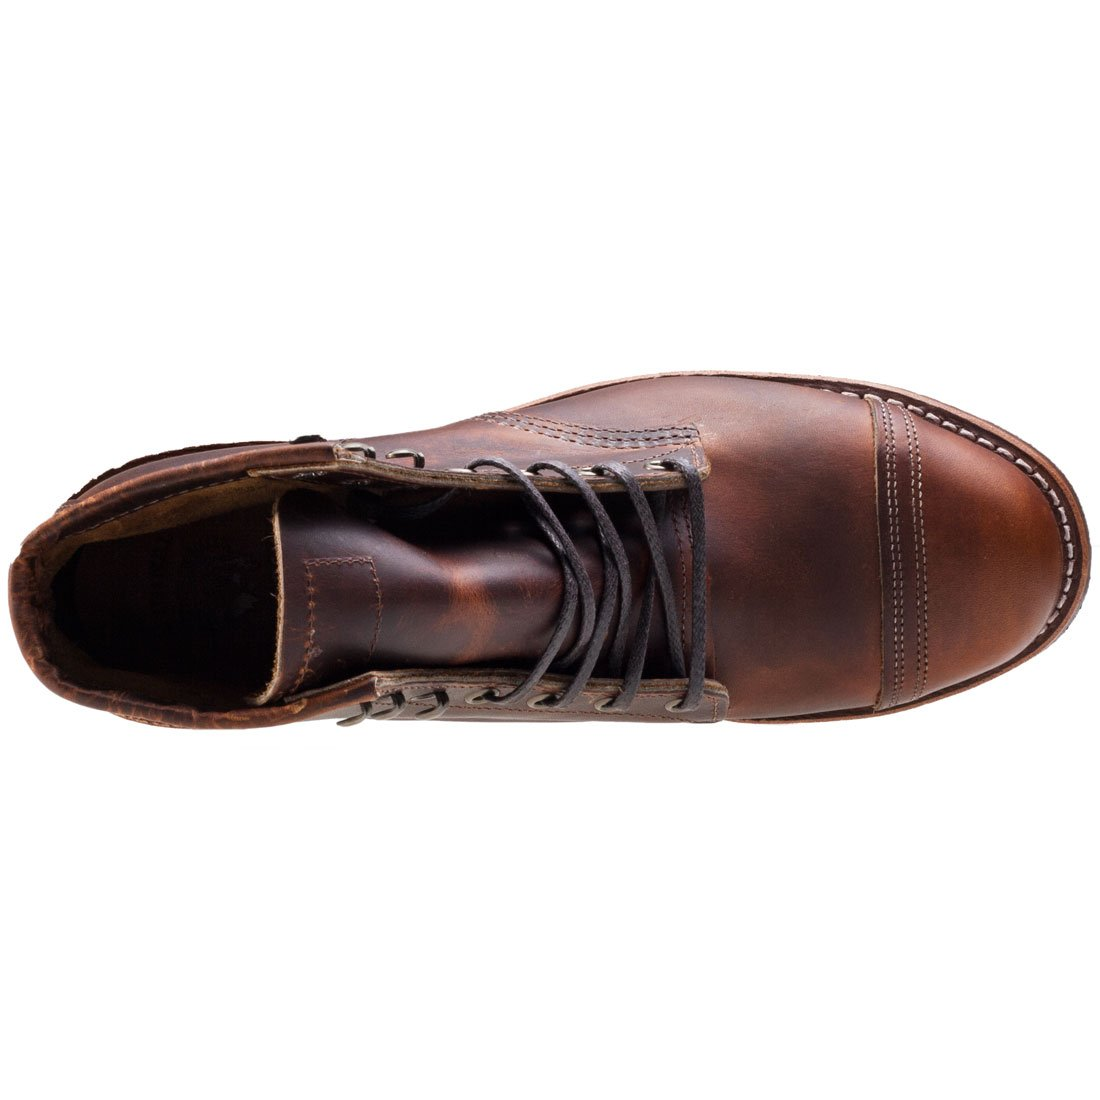 Chippewa Boots 6' Homestead 1901G48 Cordovan Buy